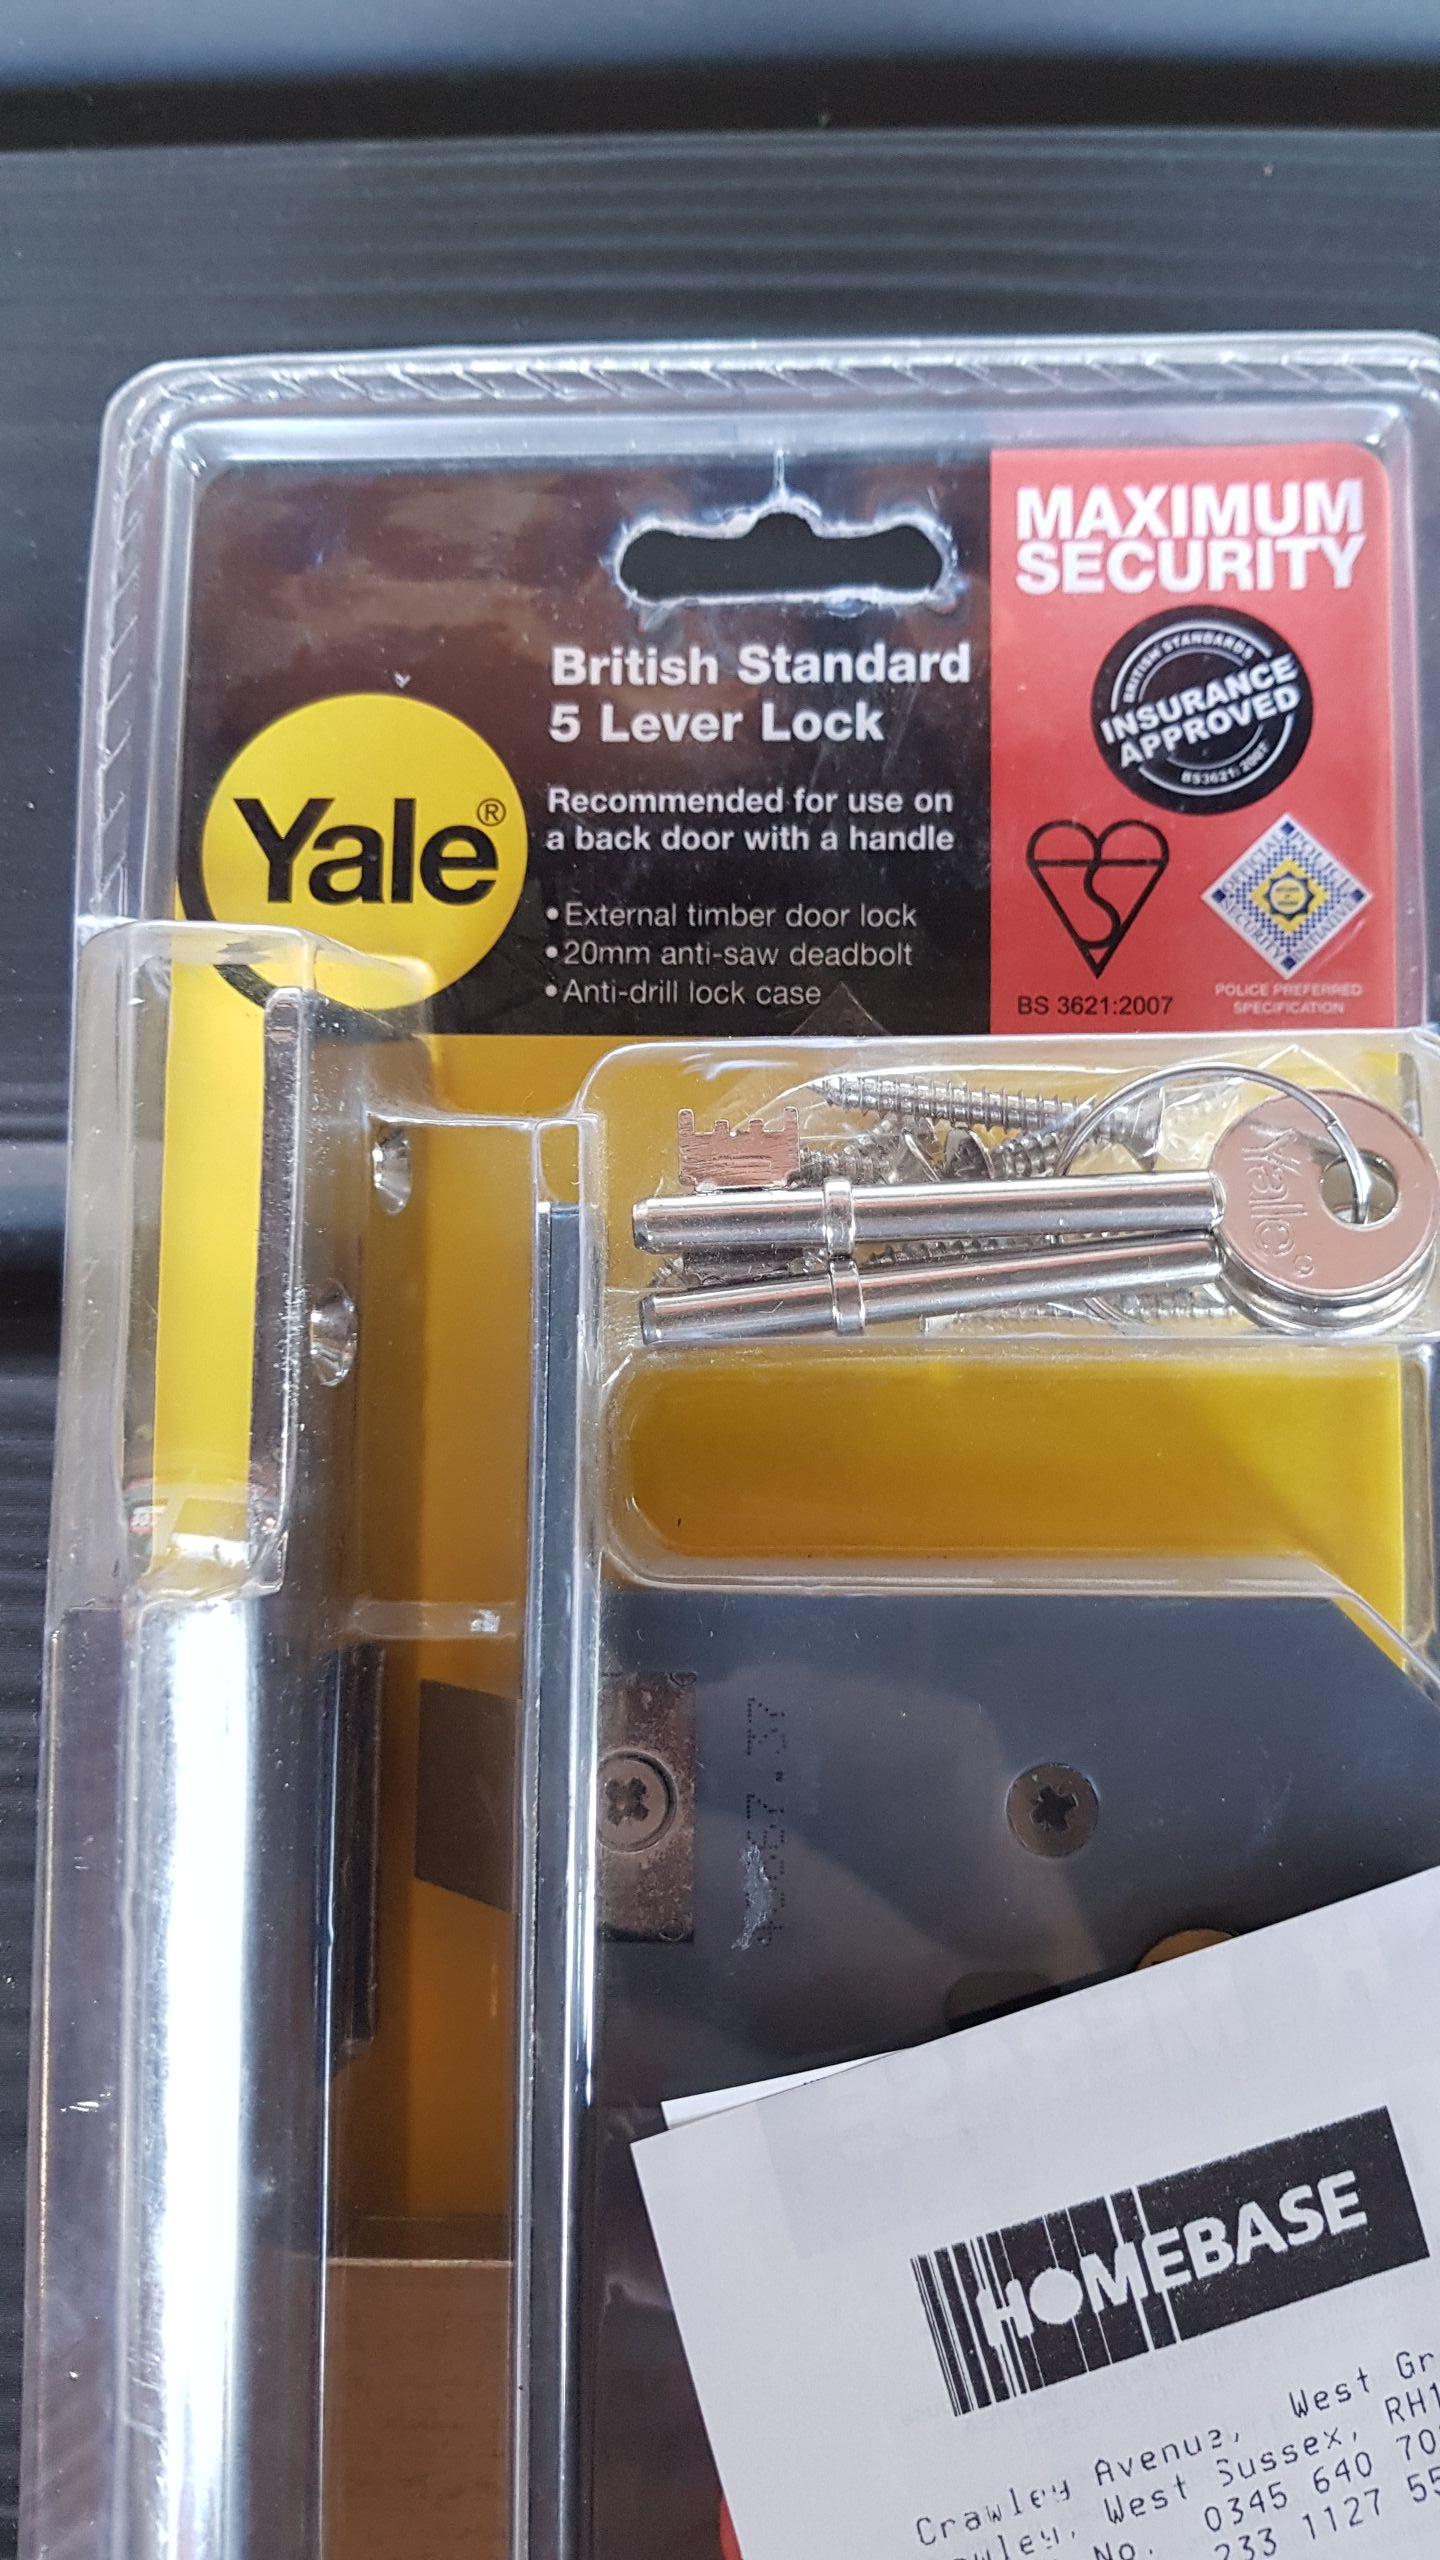 Yale British Standard 5 Lever Lock £10.80 @ Homebase (Crawley)